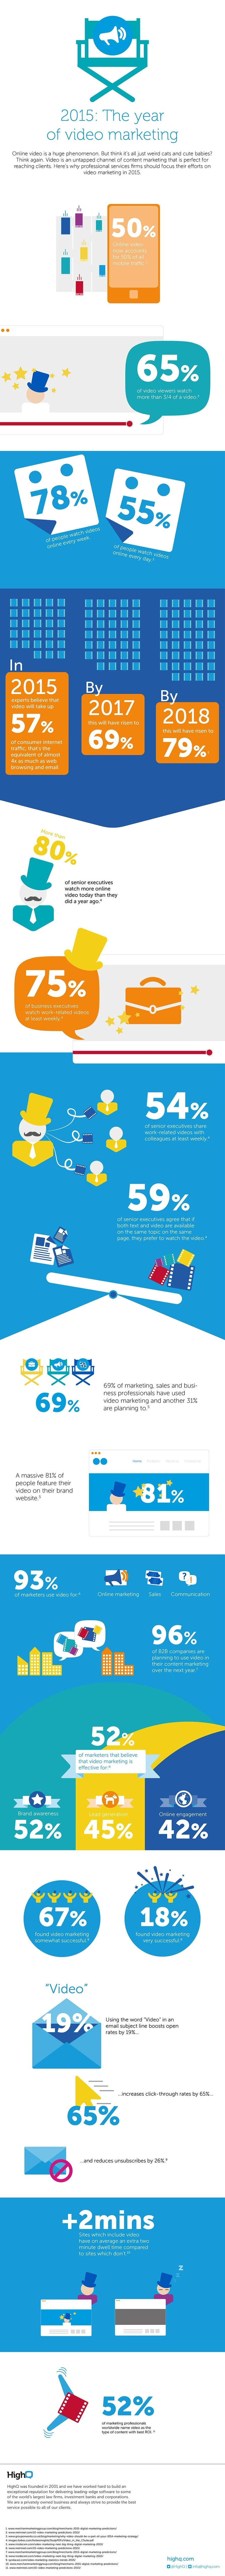 video-marketing-infographic